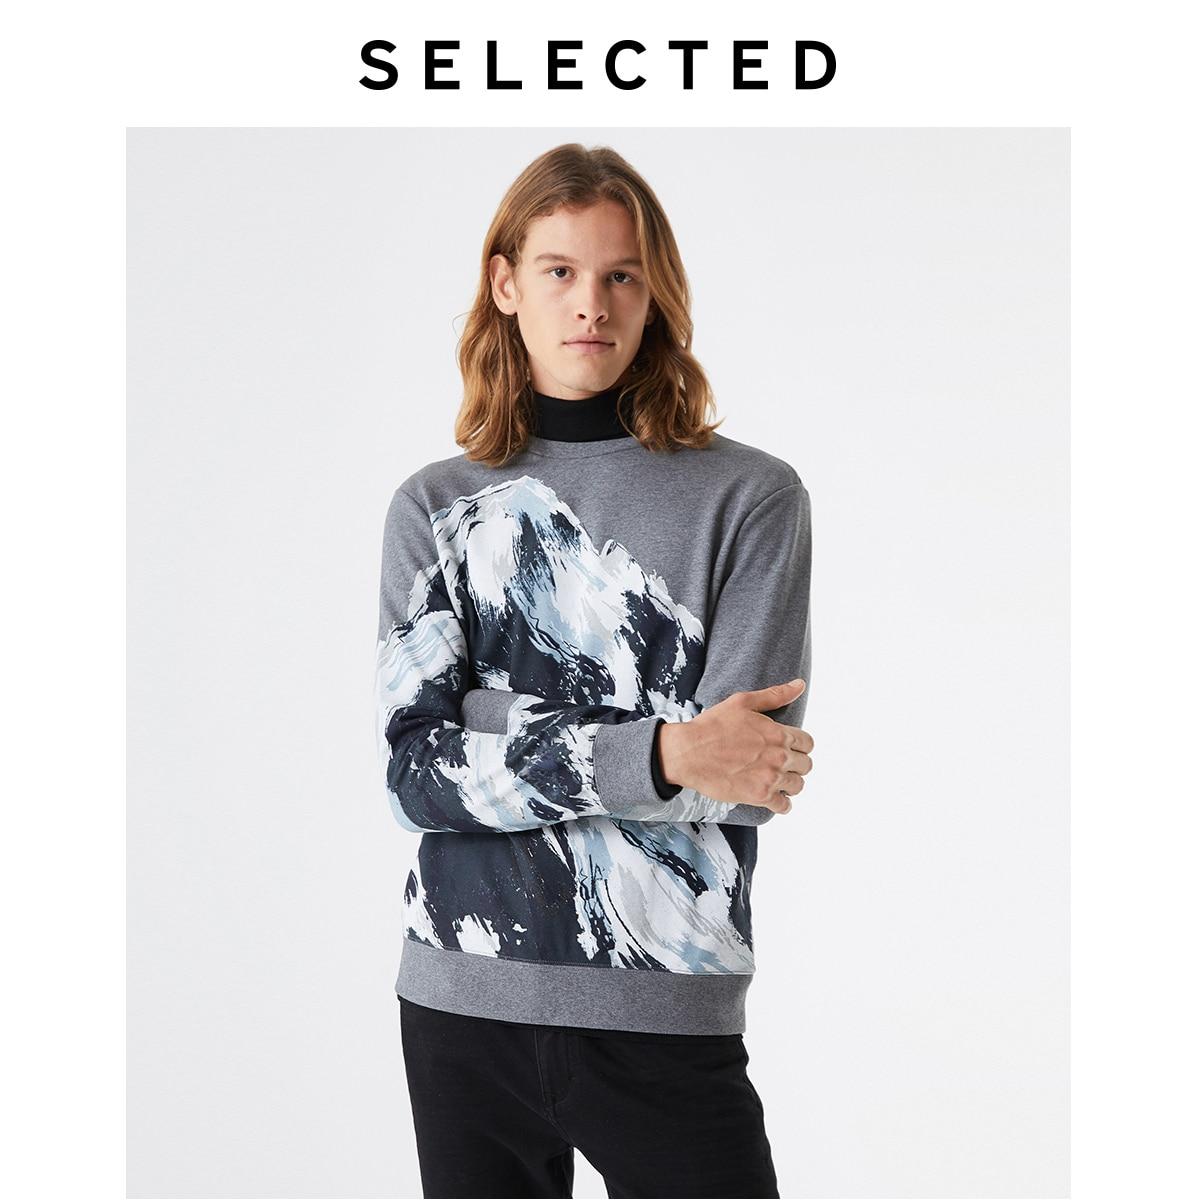 SELECTED Men's Autumn 100% Cotton Printed Long-sleeved Sweatshirt S|41934D516